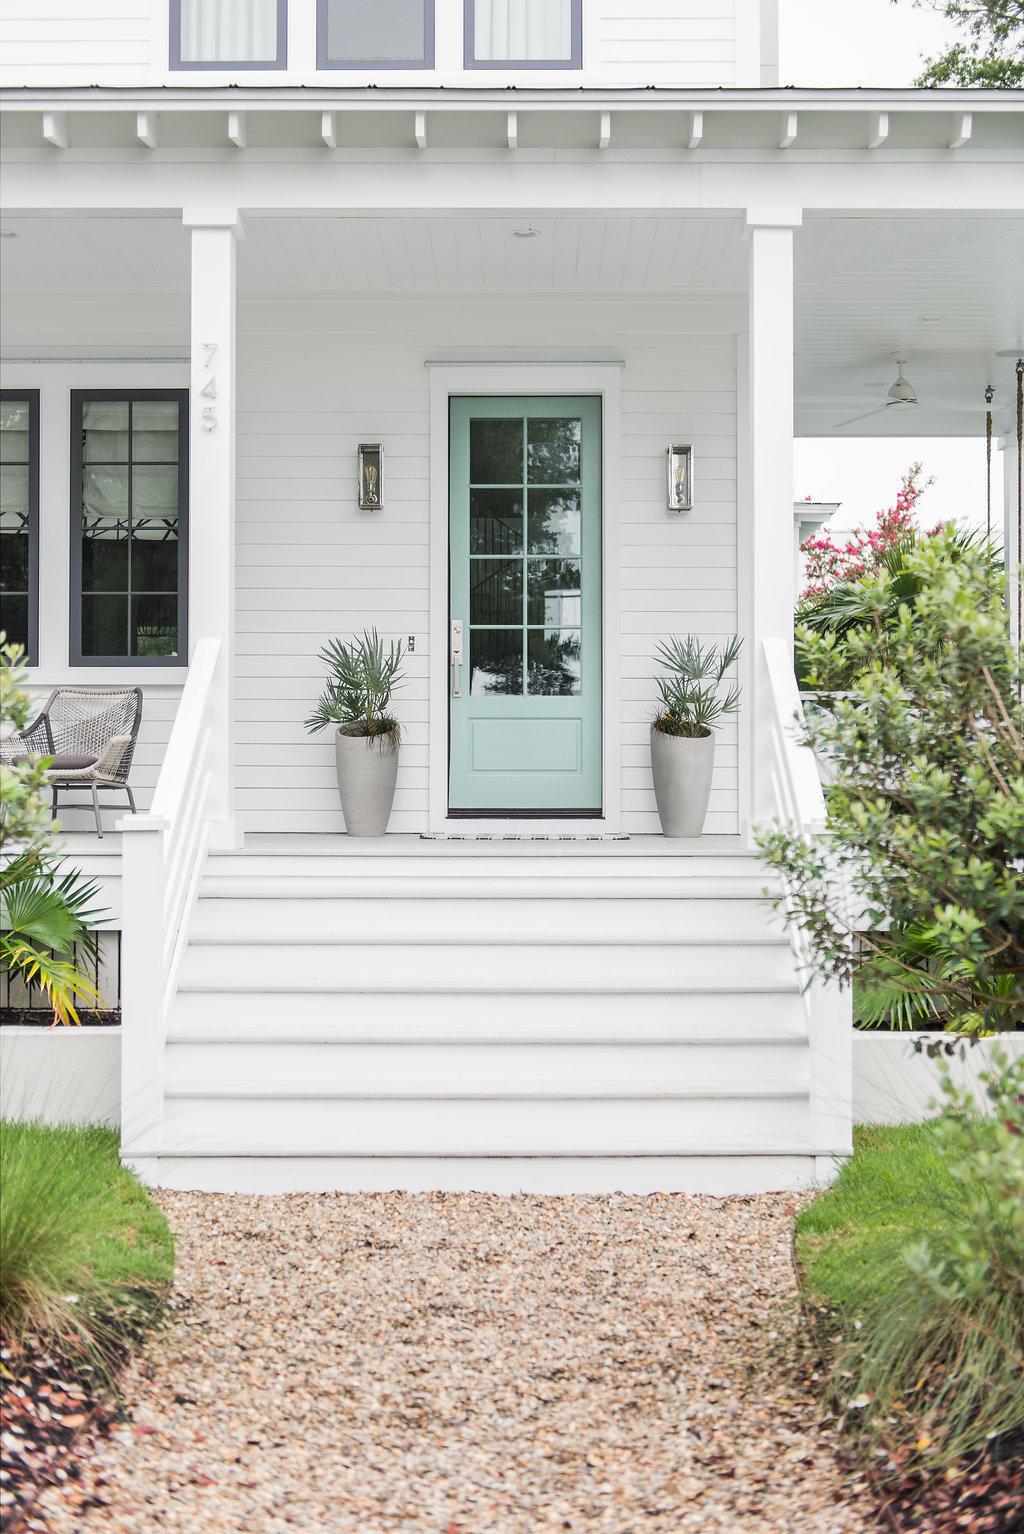 Old Mt Pleasant Homes For Sale - 745 Winthrop, Mount Pleasant, SC - 56